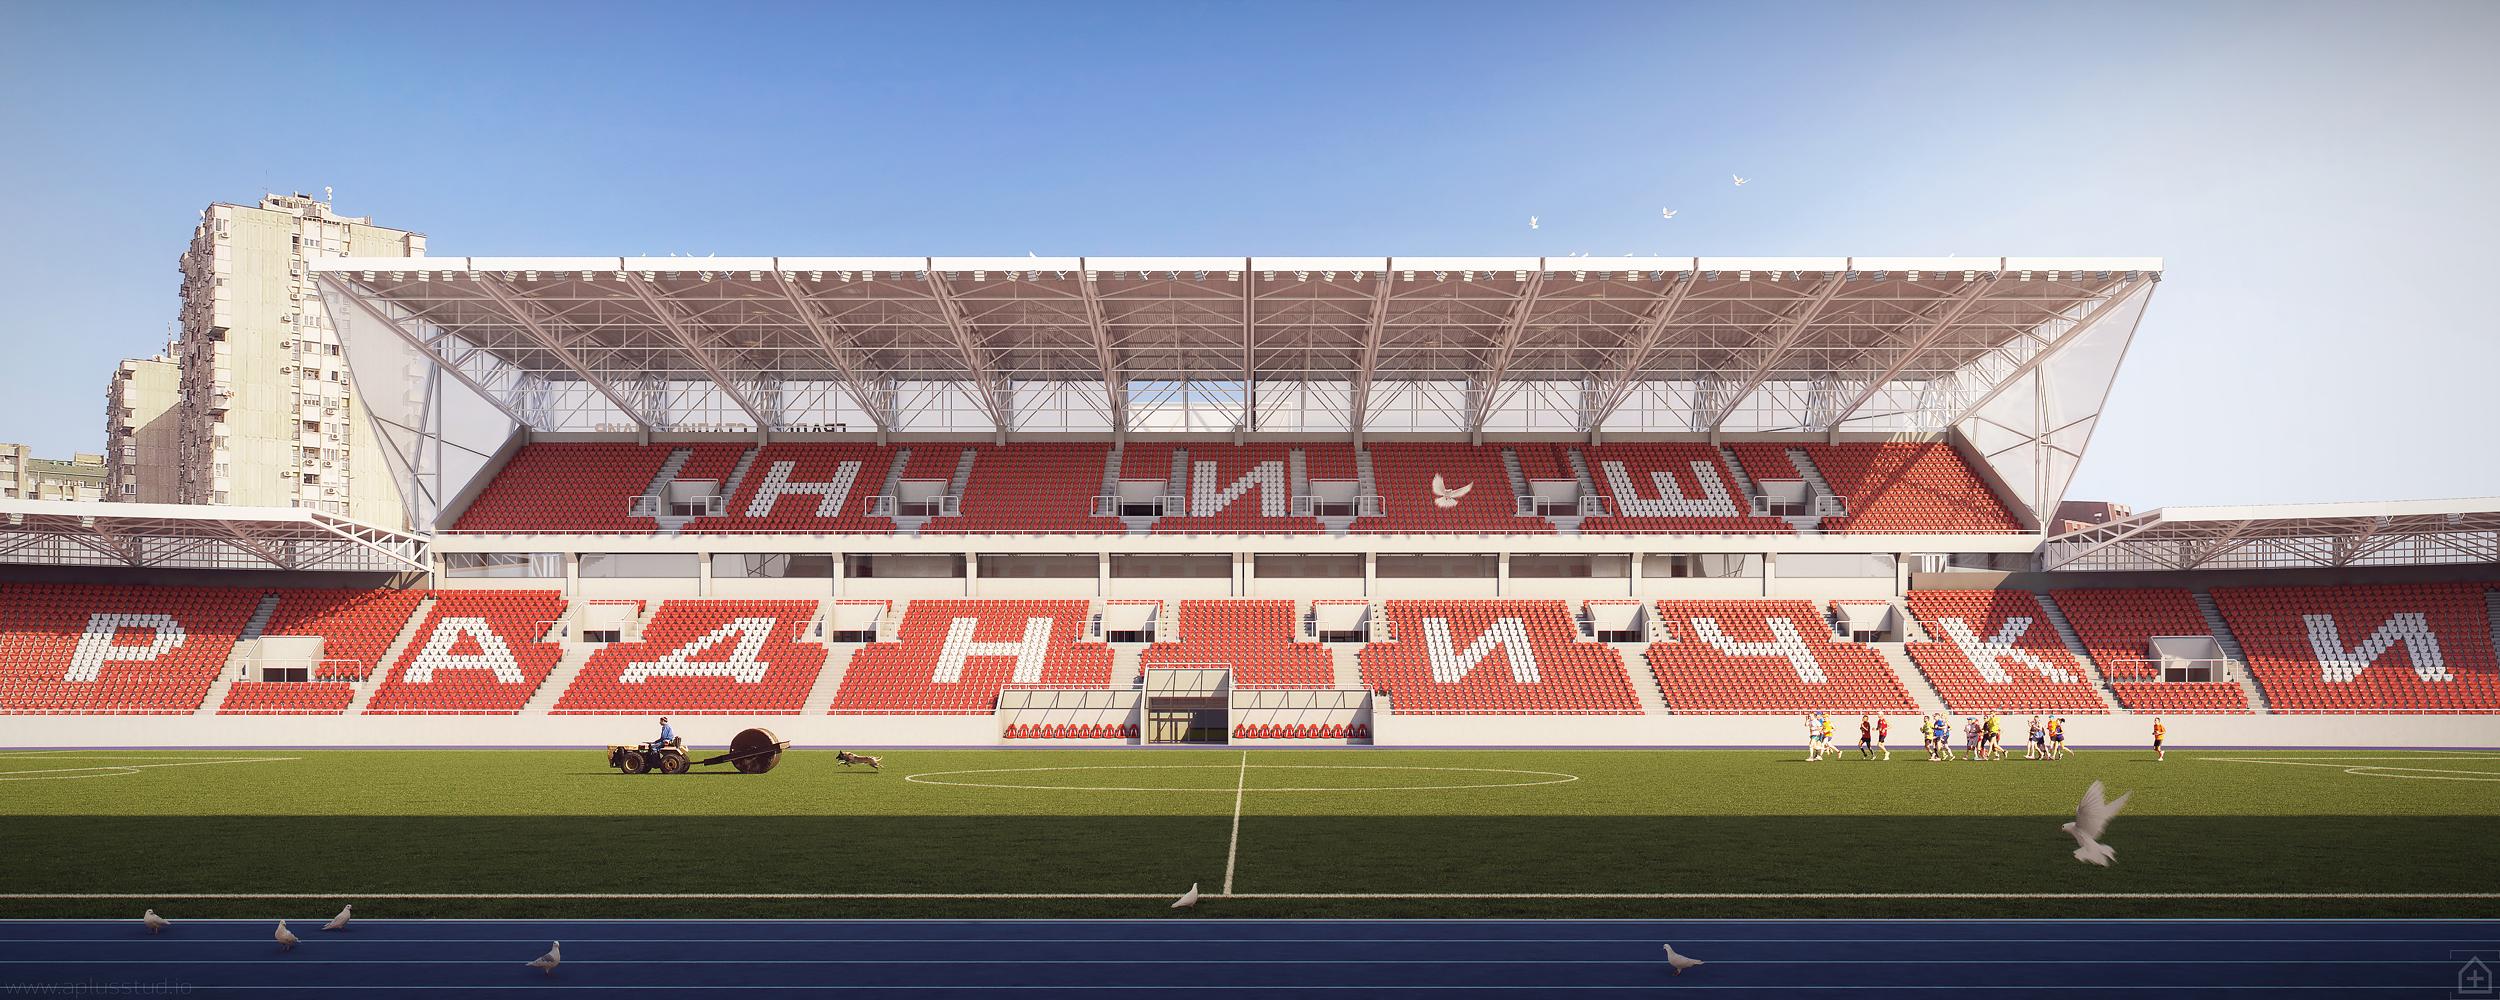 kapaprojekt_cair_stadium_02_a+studio_2k.jpg